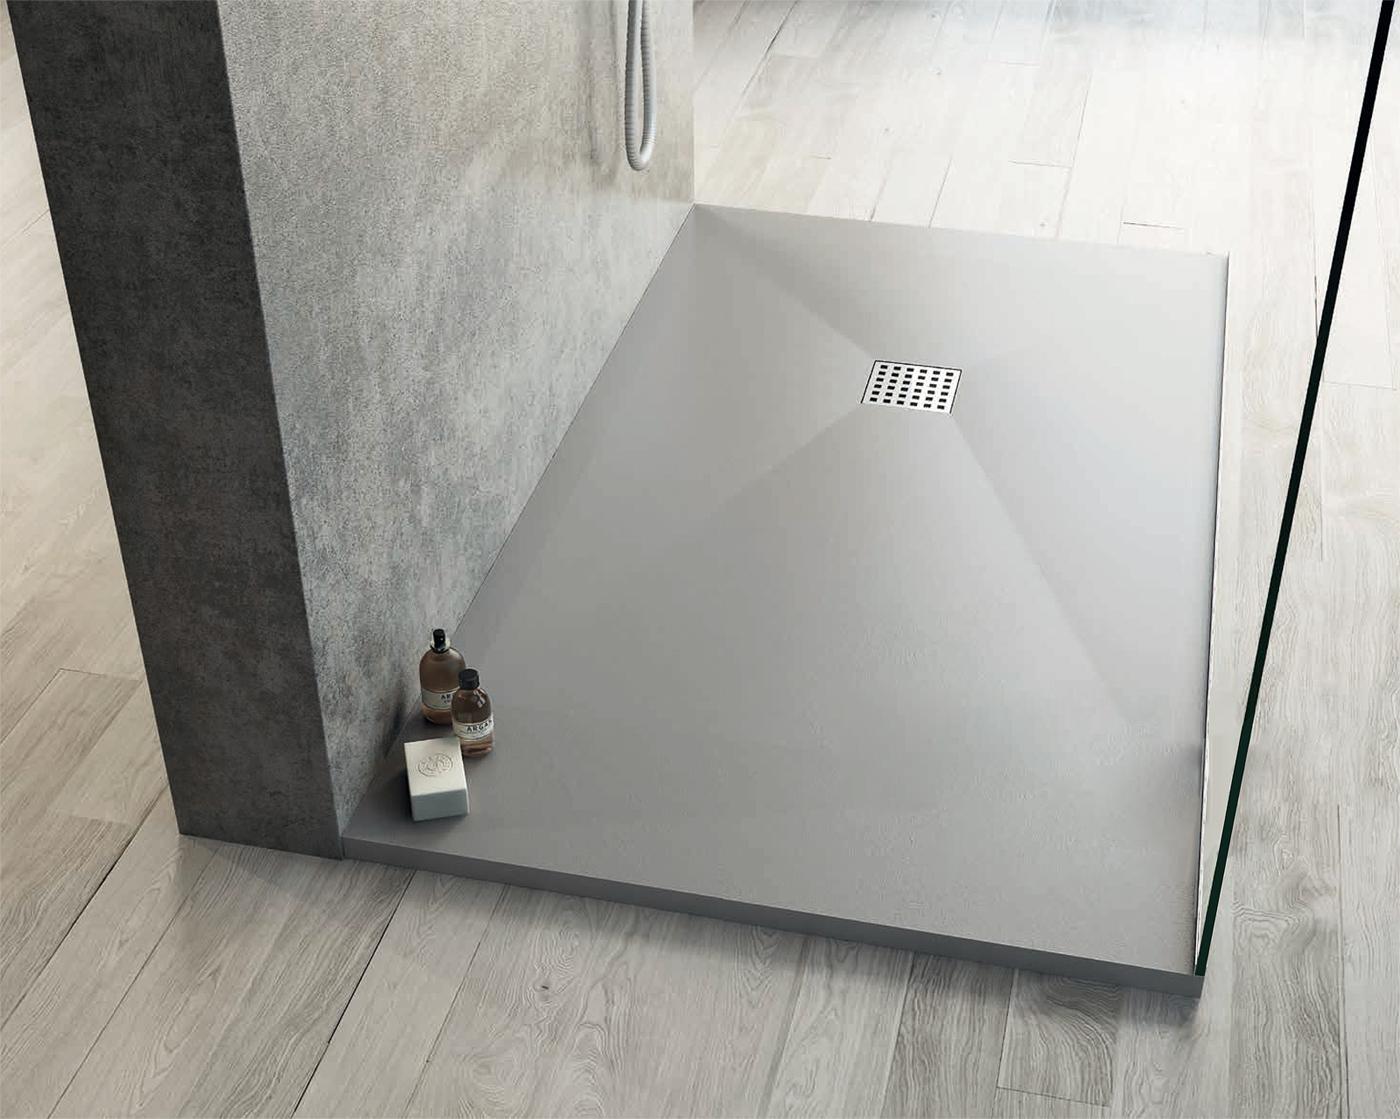 SOLISTONE linnovativo piatto doccia con effetto pietra! - SINTESIBAGNOBLOG